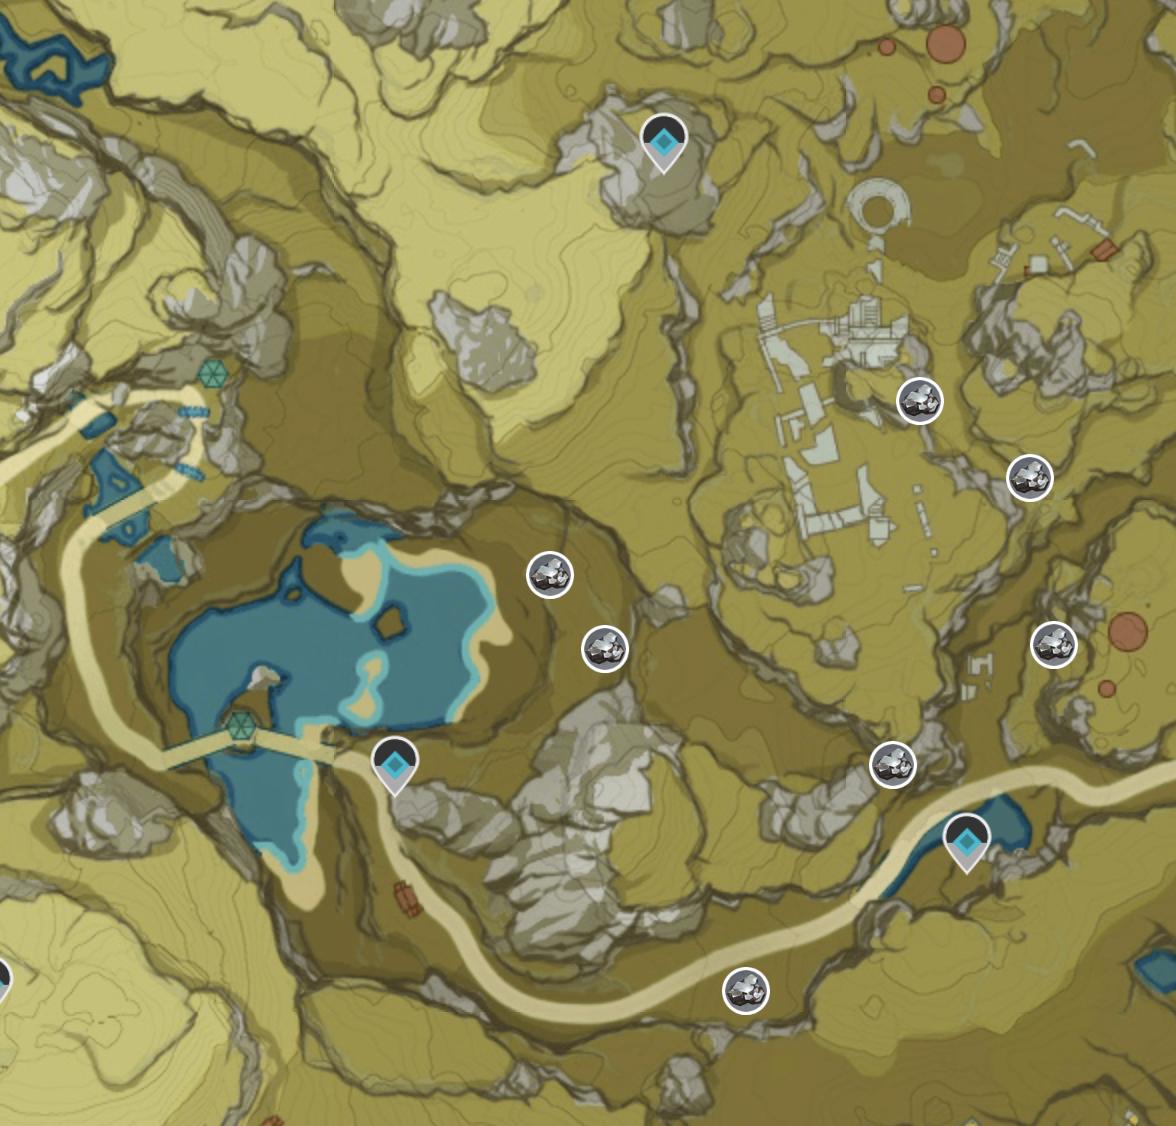 Genshin Impact White Iron Chunk Ore Map East of Jueyunjian Zoomed In